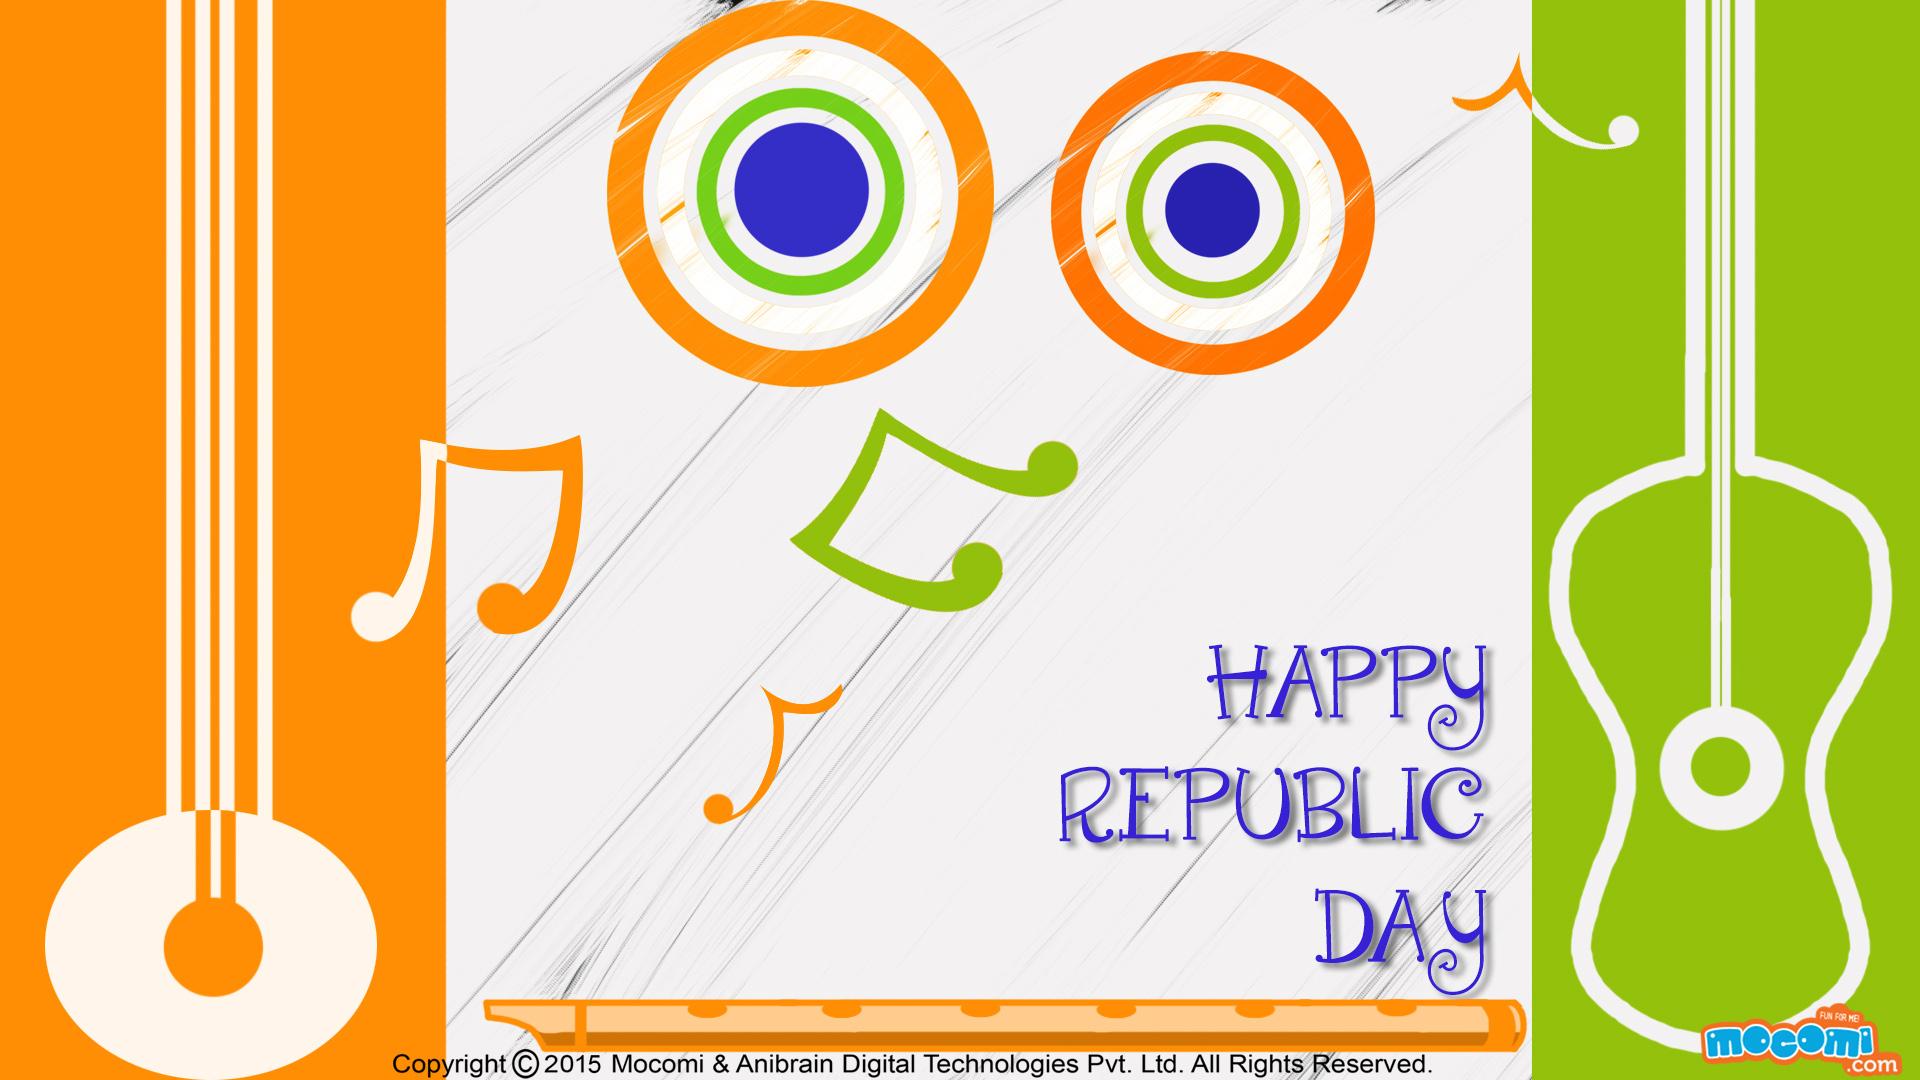 Happy Republic Day Wallpaper – 9